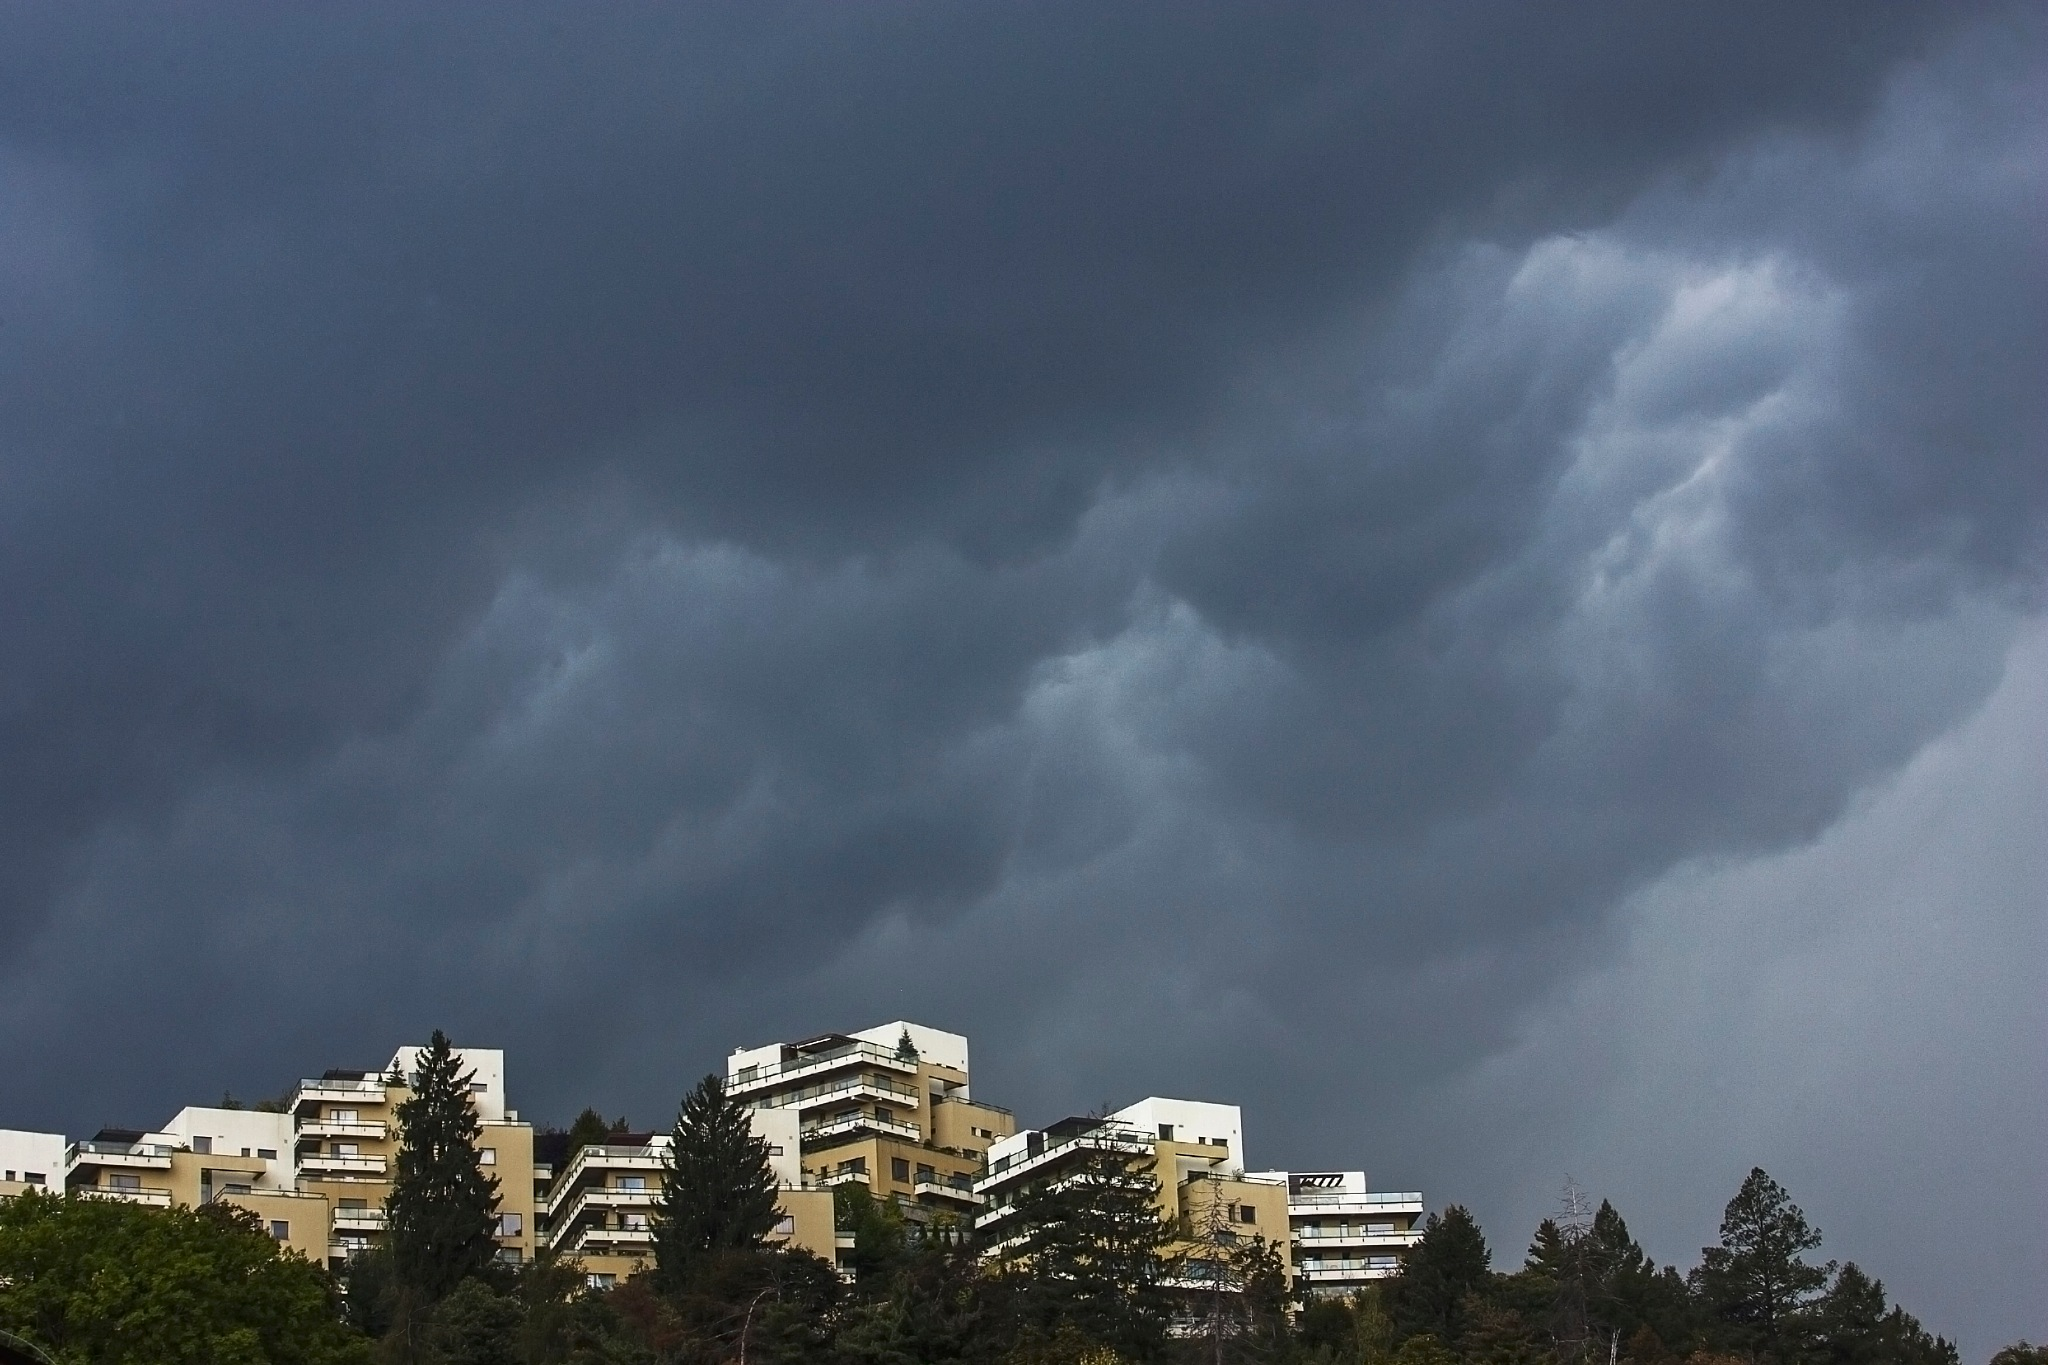 storm coming by leonard.petraru